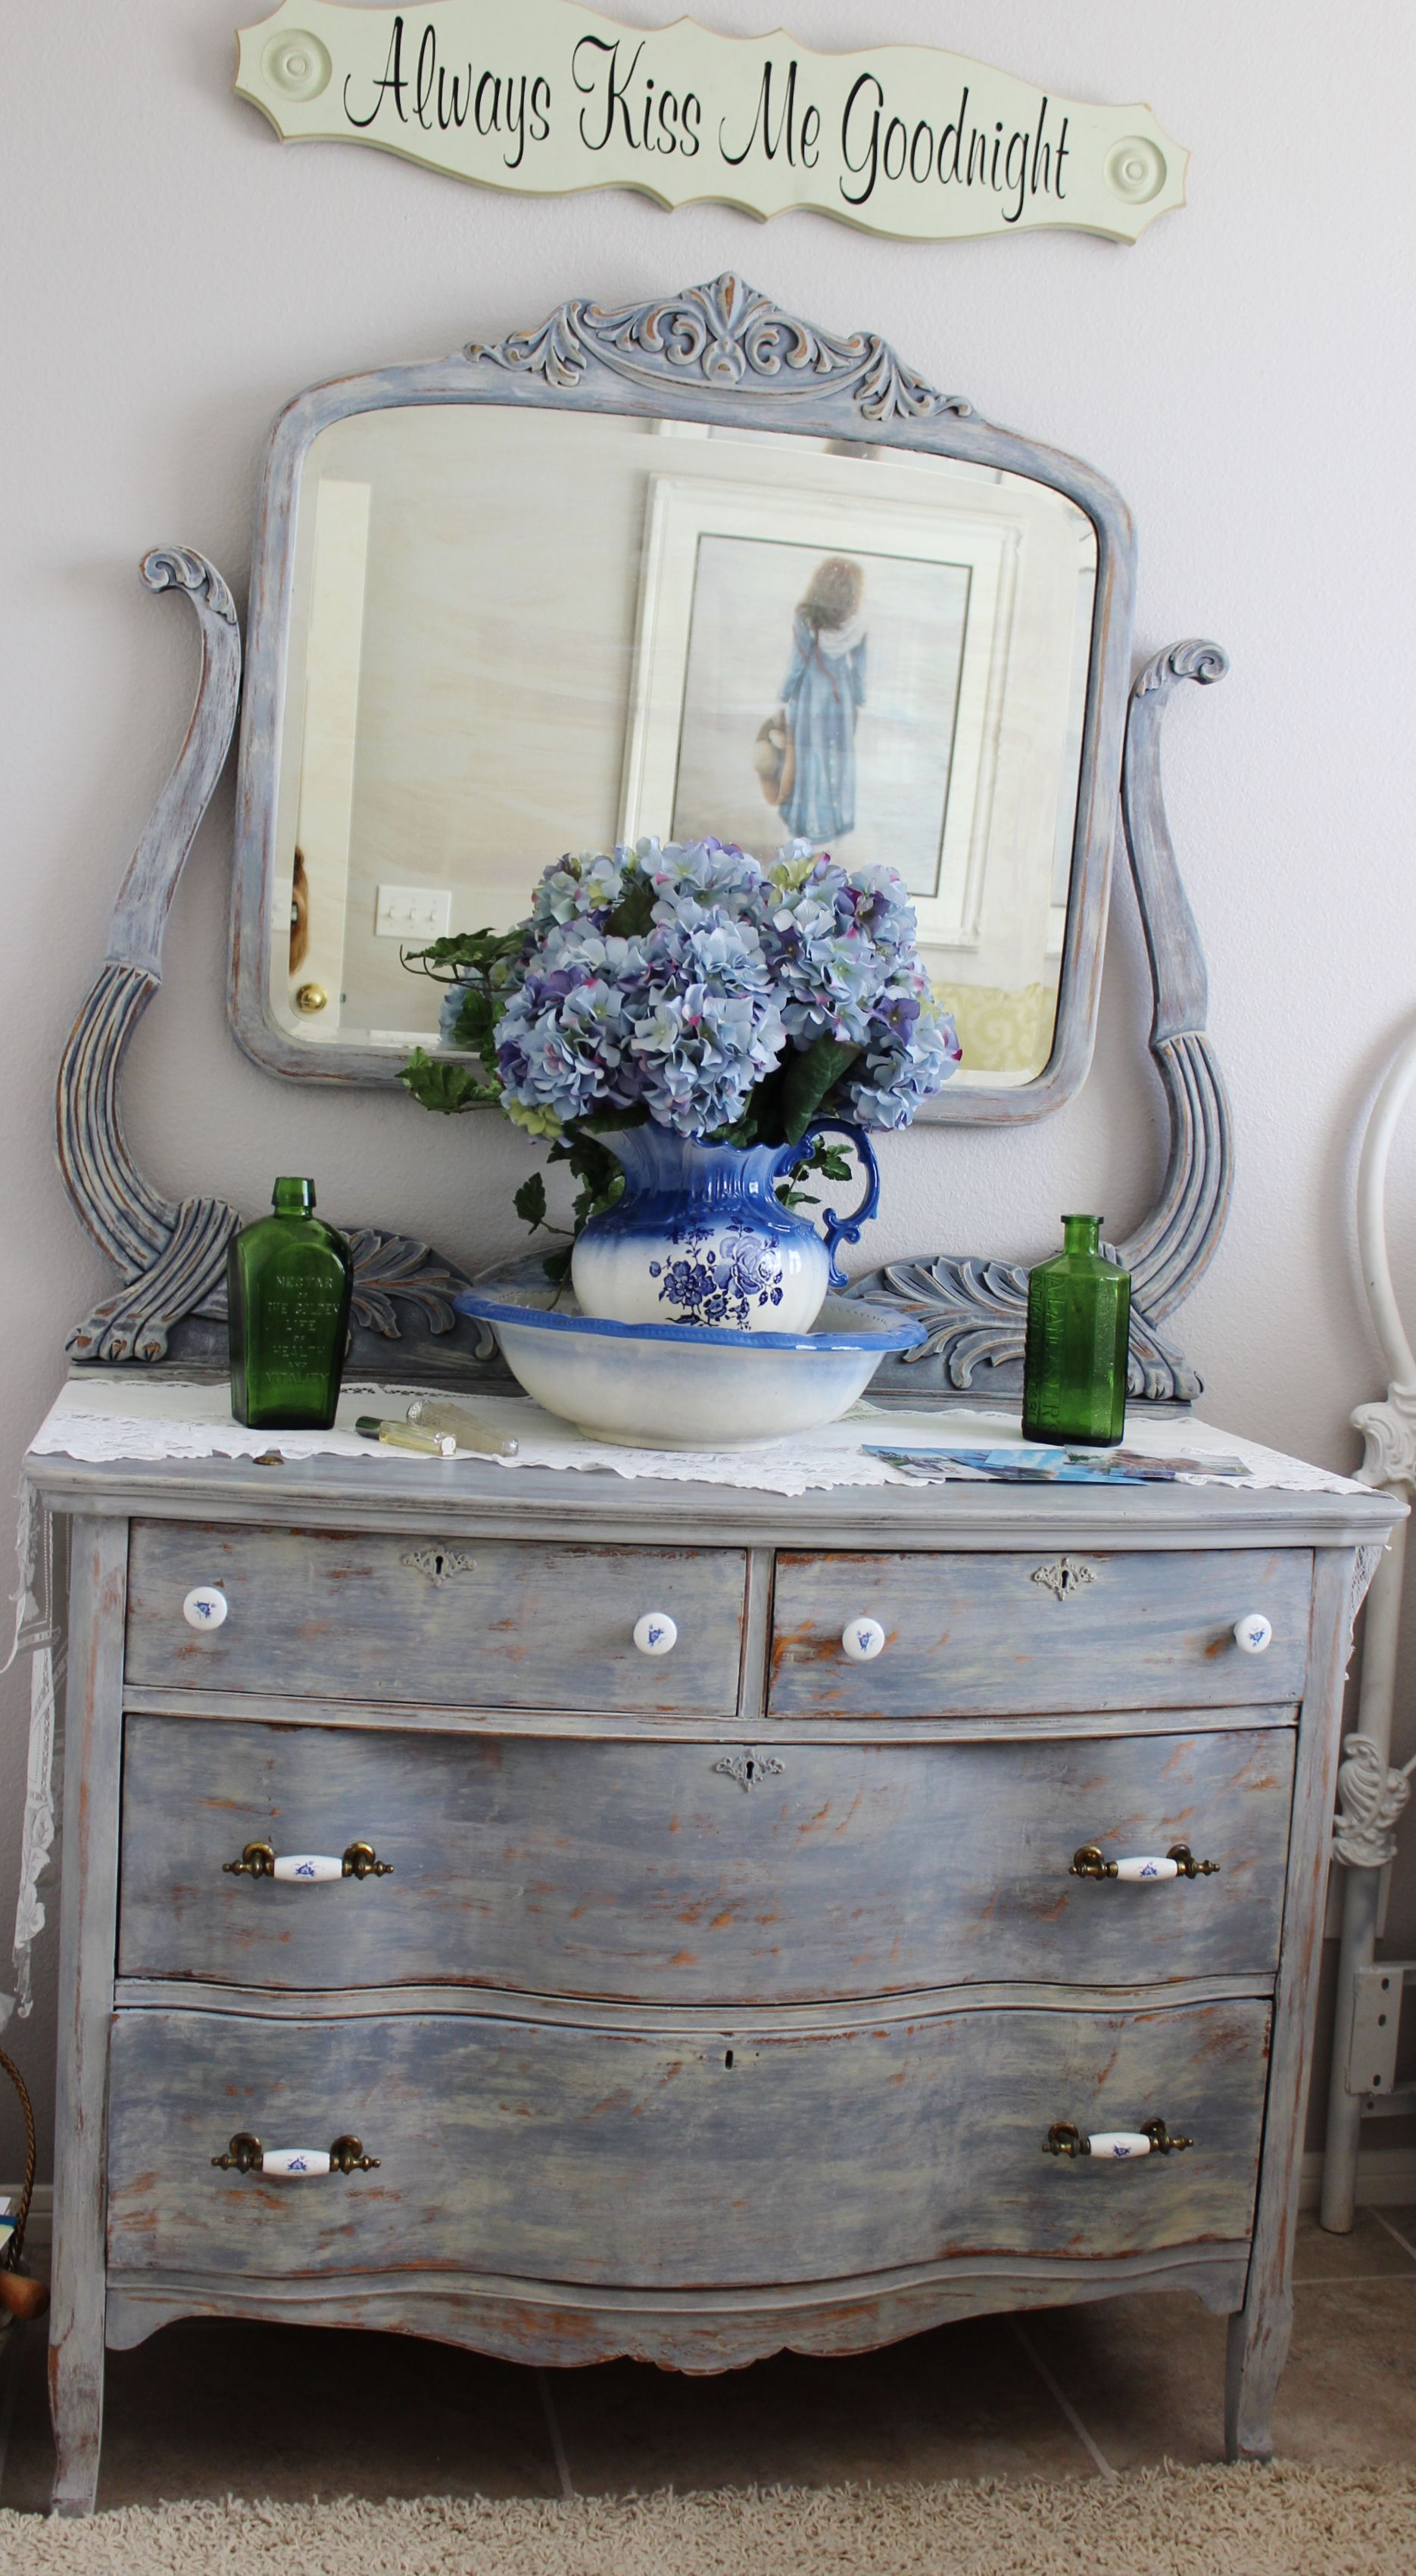 annie sloan chalk paint project let 39 s make it let 39 s try it pint. Black Bedroom Furniture Sets. Home Design Ideas